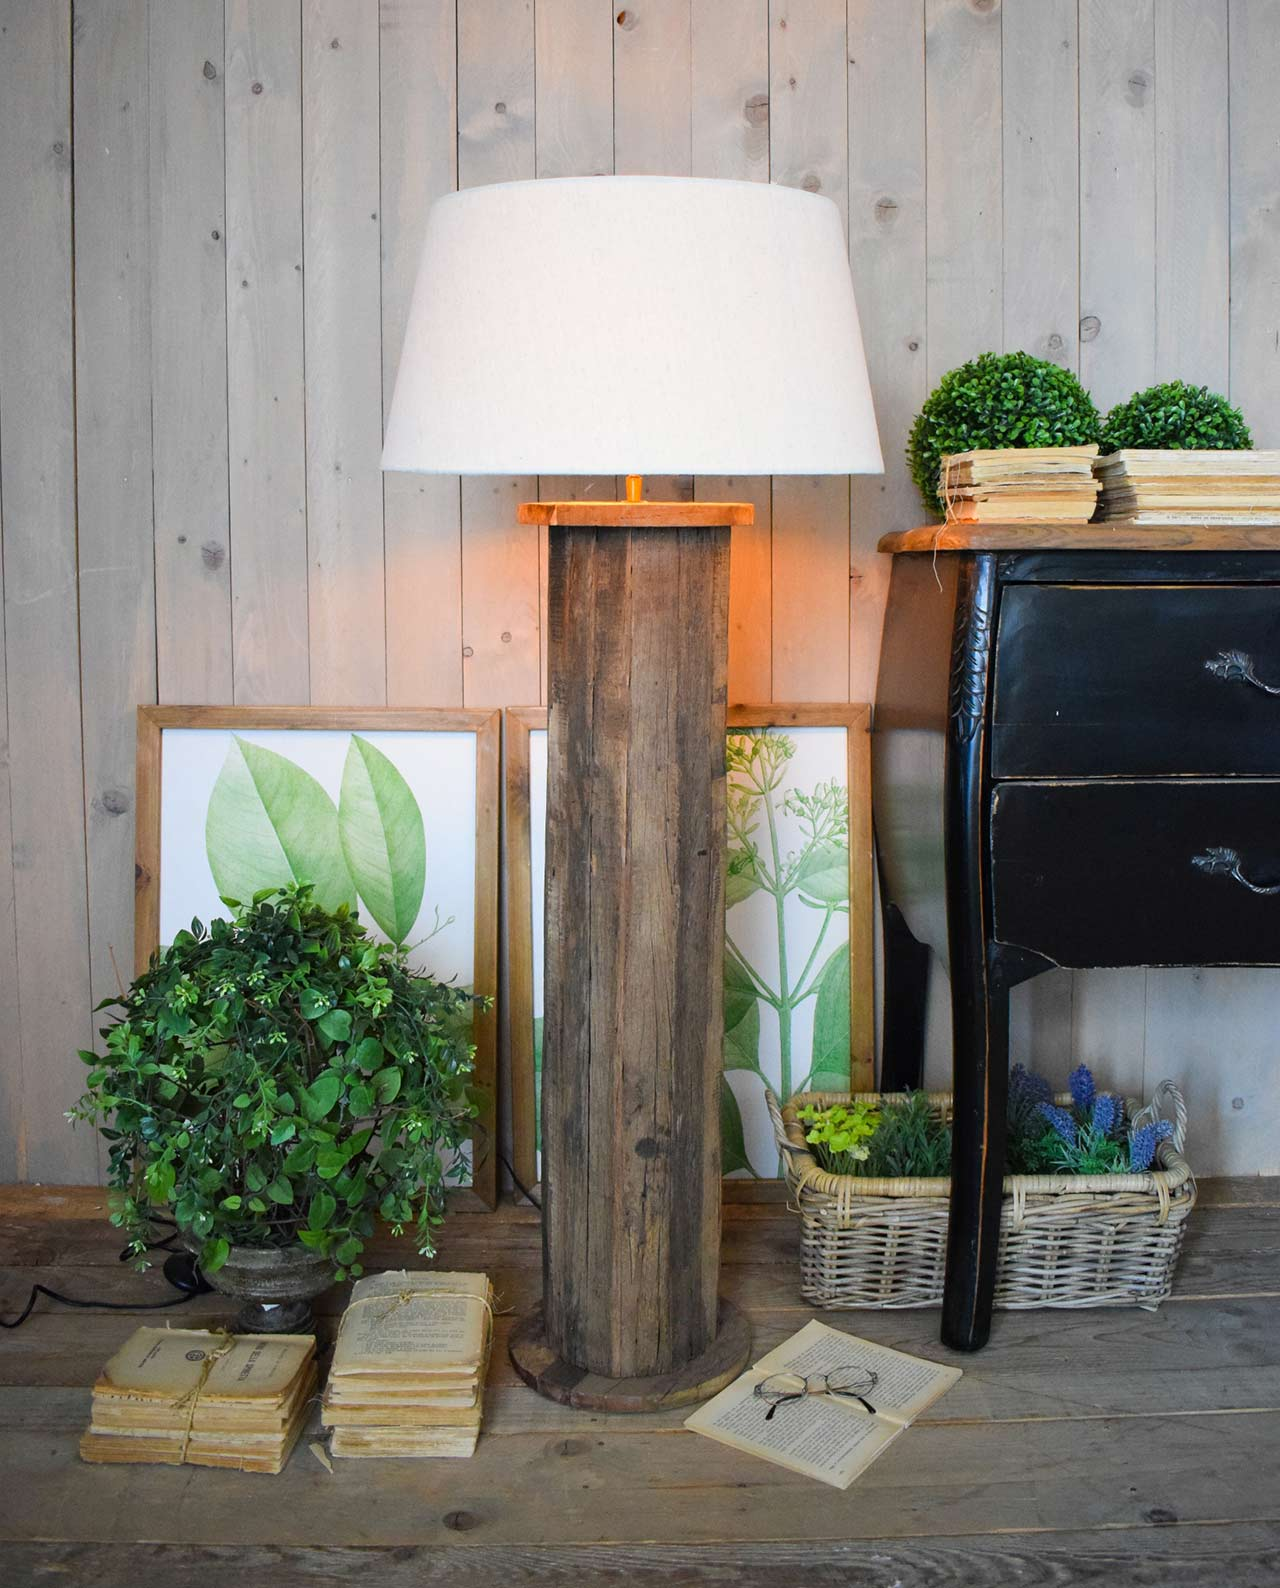 Lampade Da Terra In Legno.Lampada Da Terra Legno Aspen Mobilia Store Home Favours